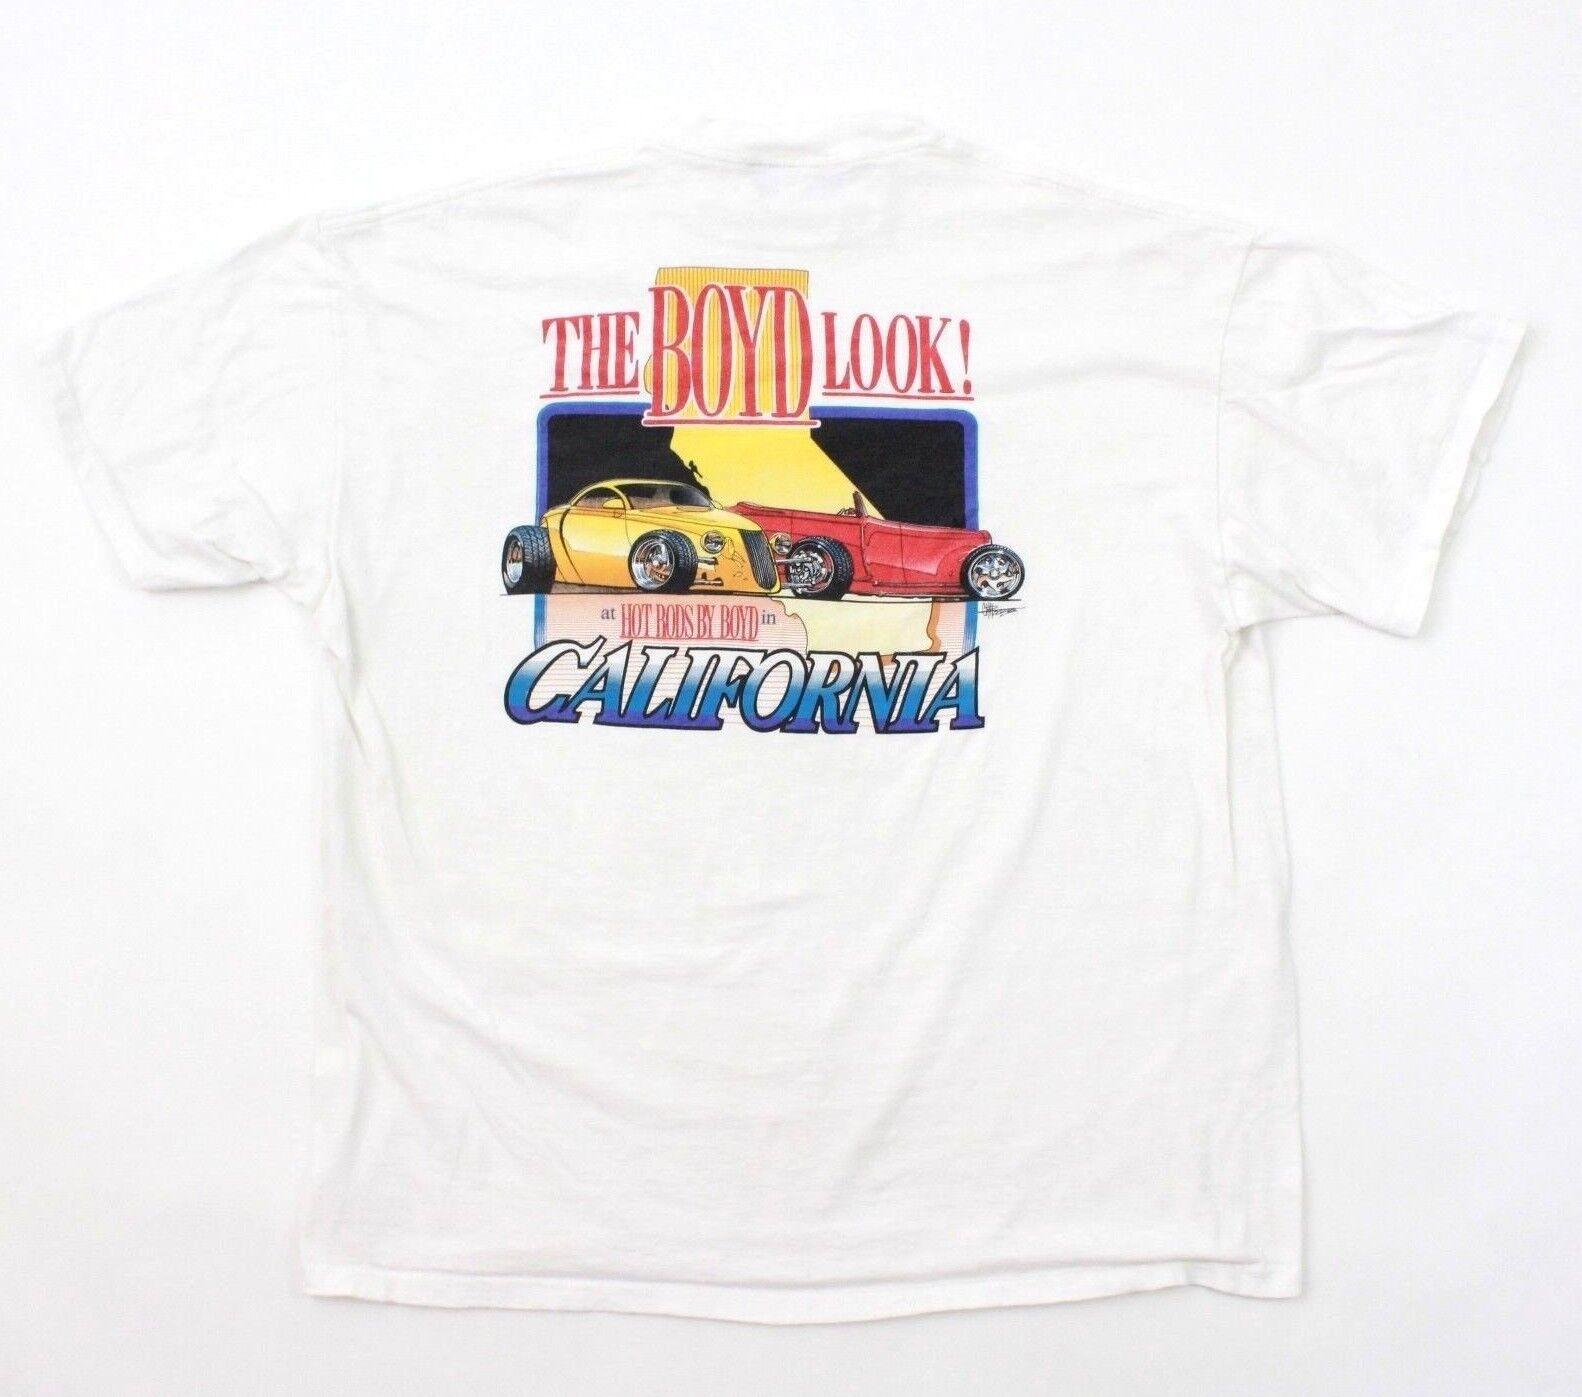 VTG Boyd Coddington T-shirt Men XXL 2XL HOT RODS BY BOYD Rendering Single Stitch